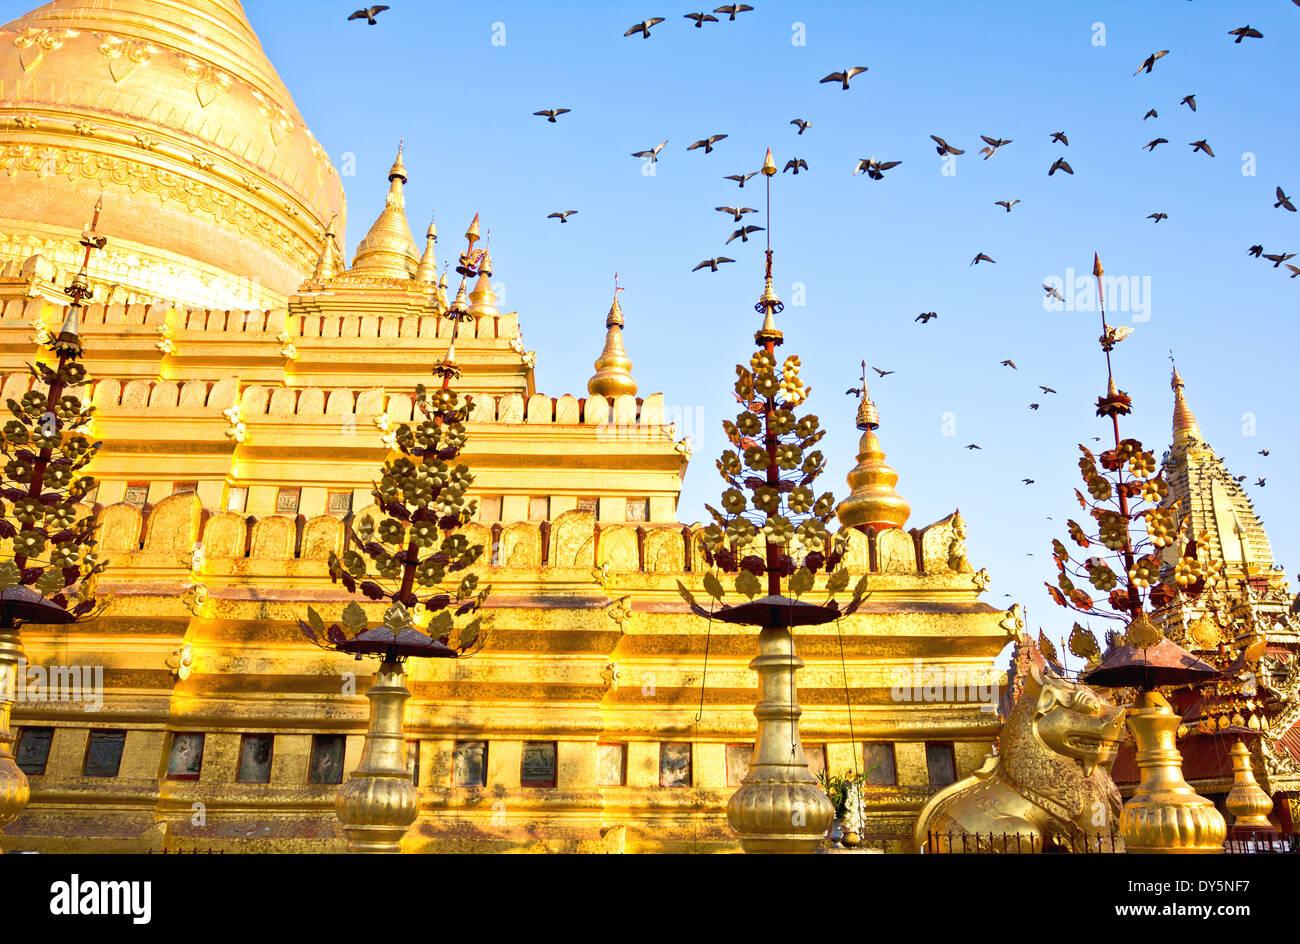 Shwezigon Pagoda or Shwezigon Paya at early morning in Bagan, Burma Stock Photo